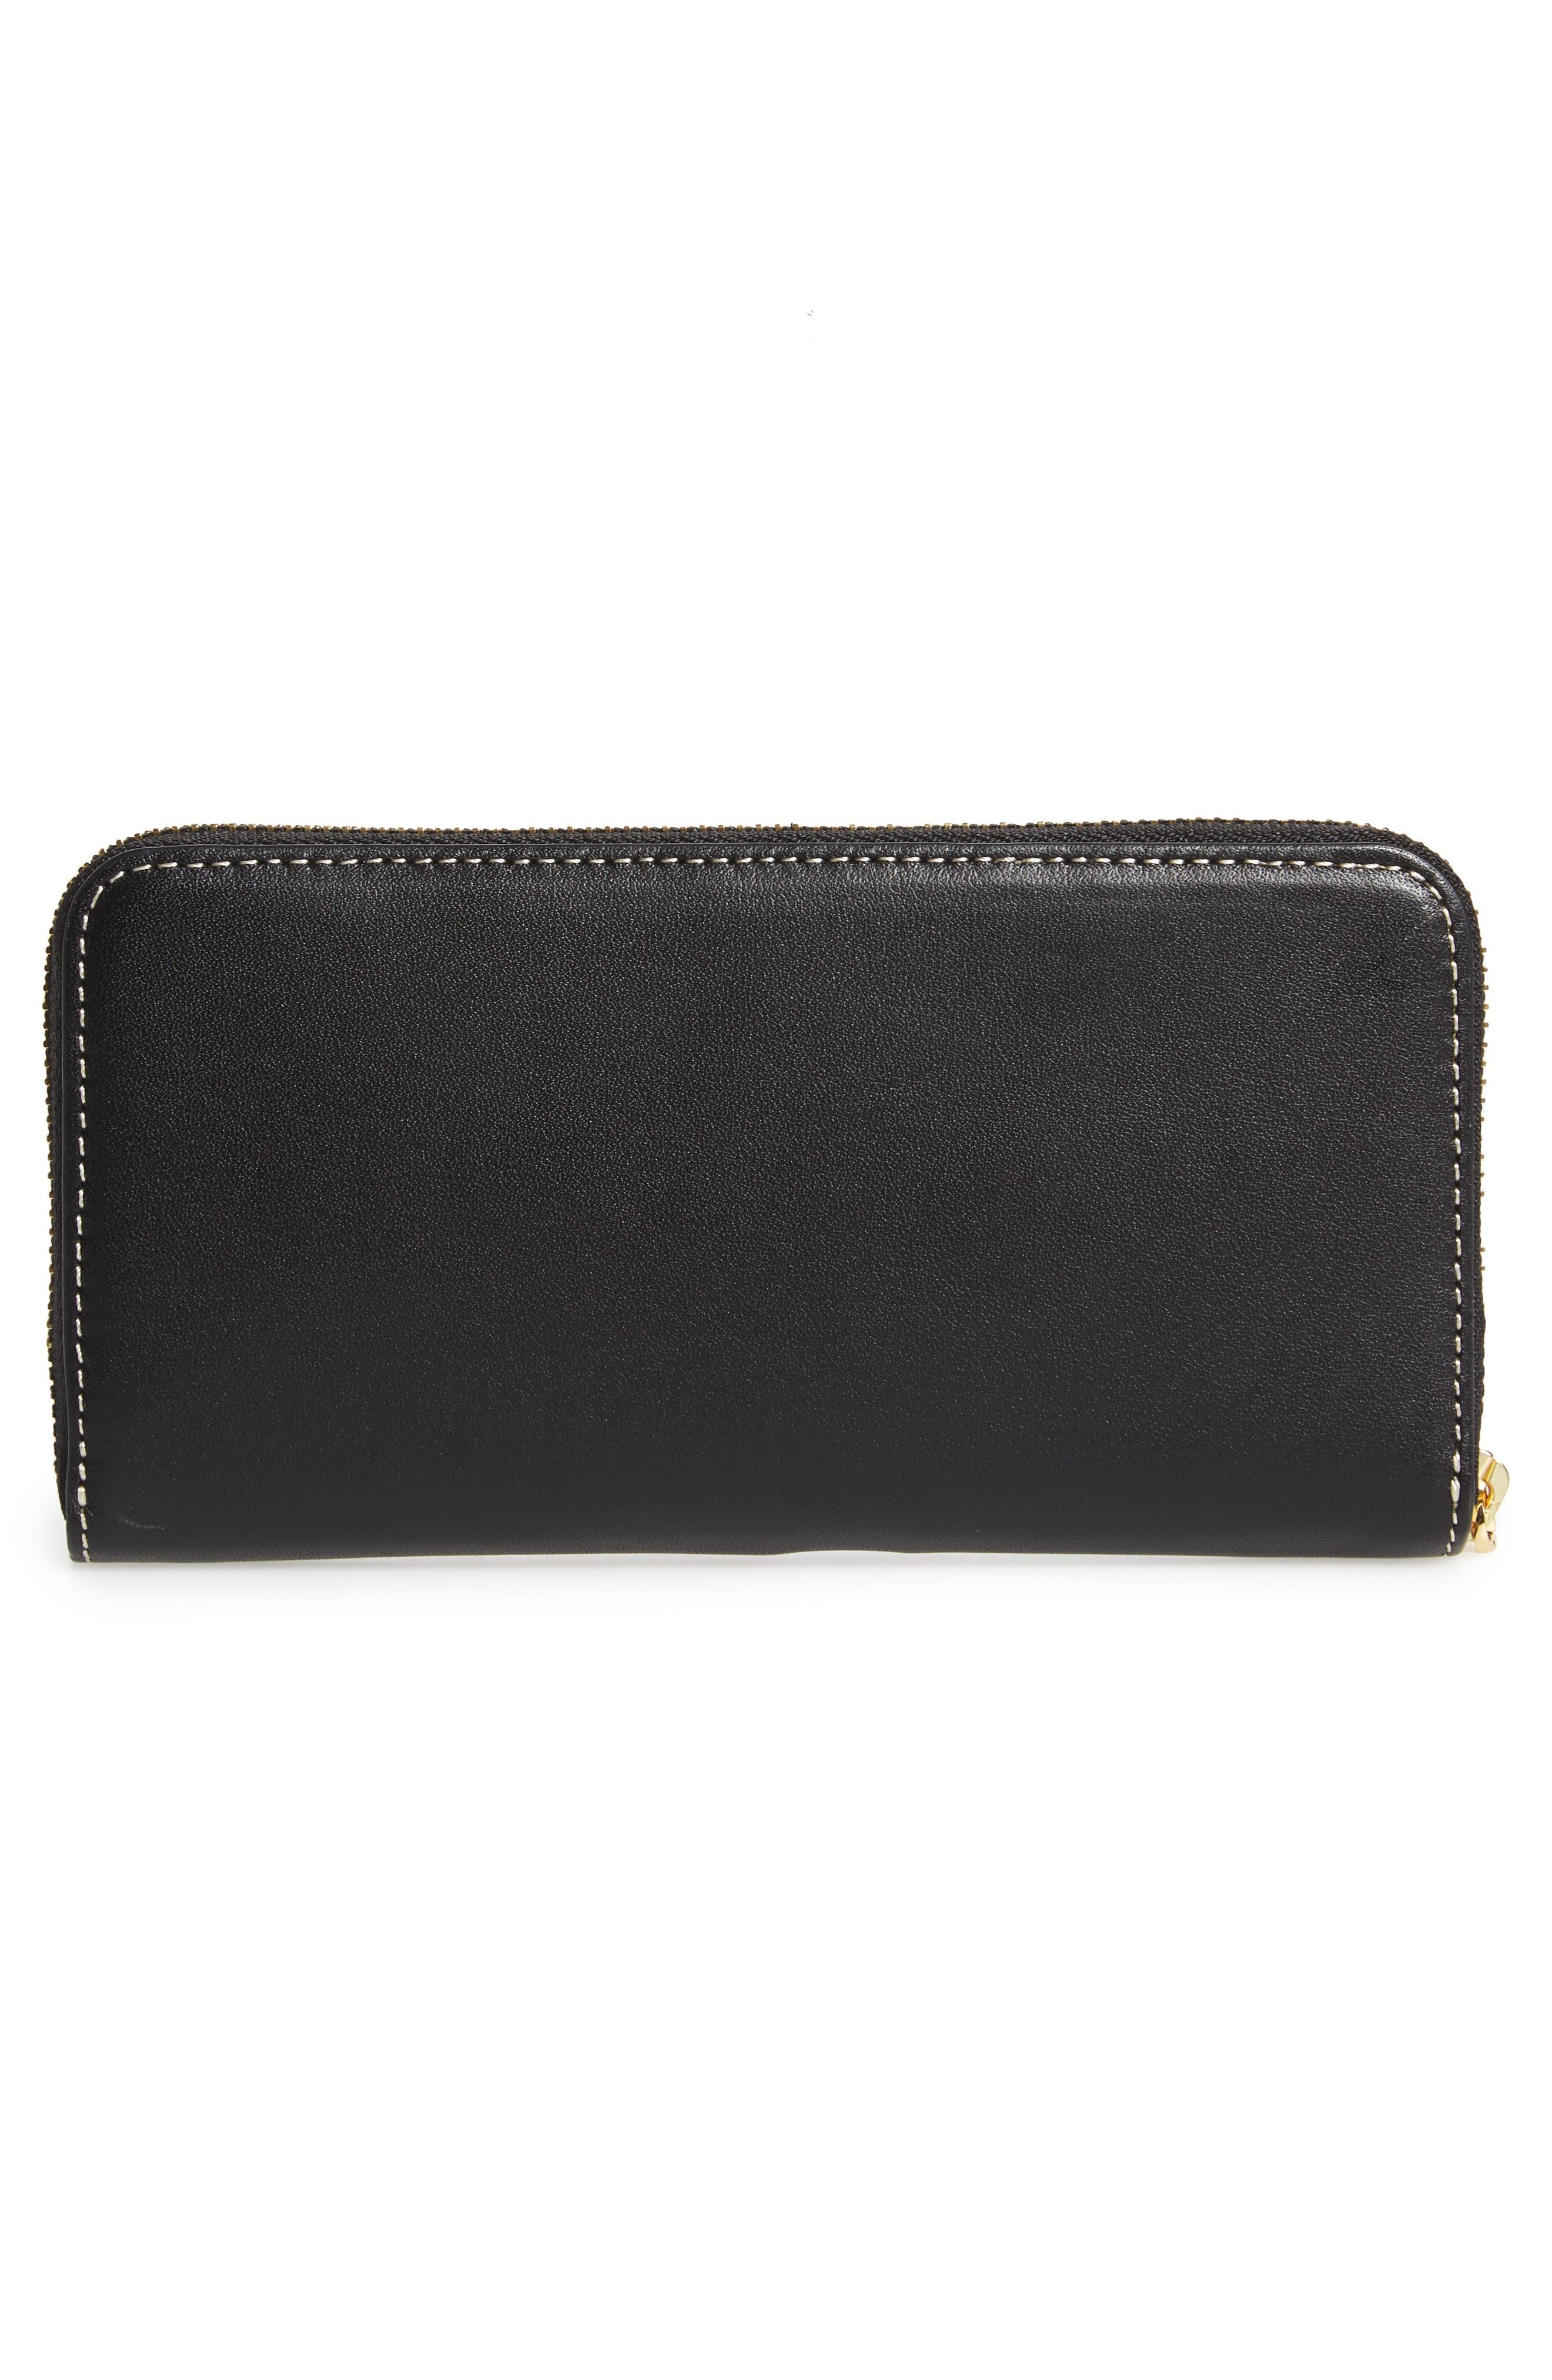 Kennedy Calfskin Leather Zip Around Wallet,                             Alternate thumbnail 3, color,                             Black